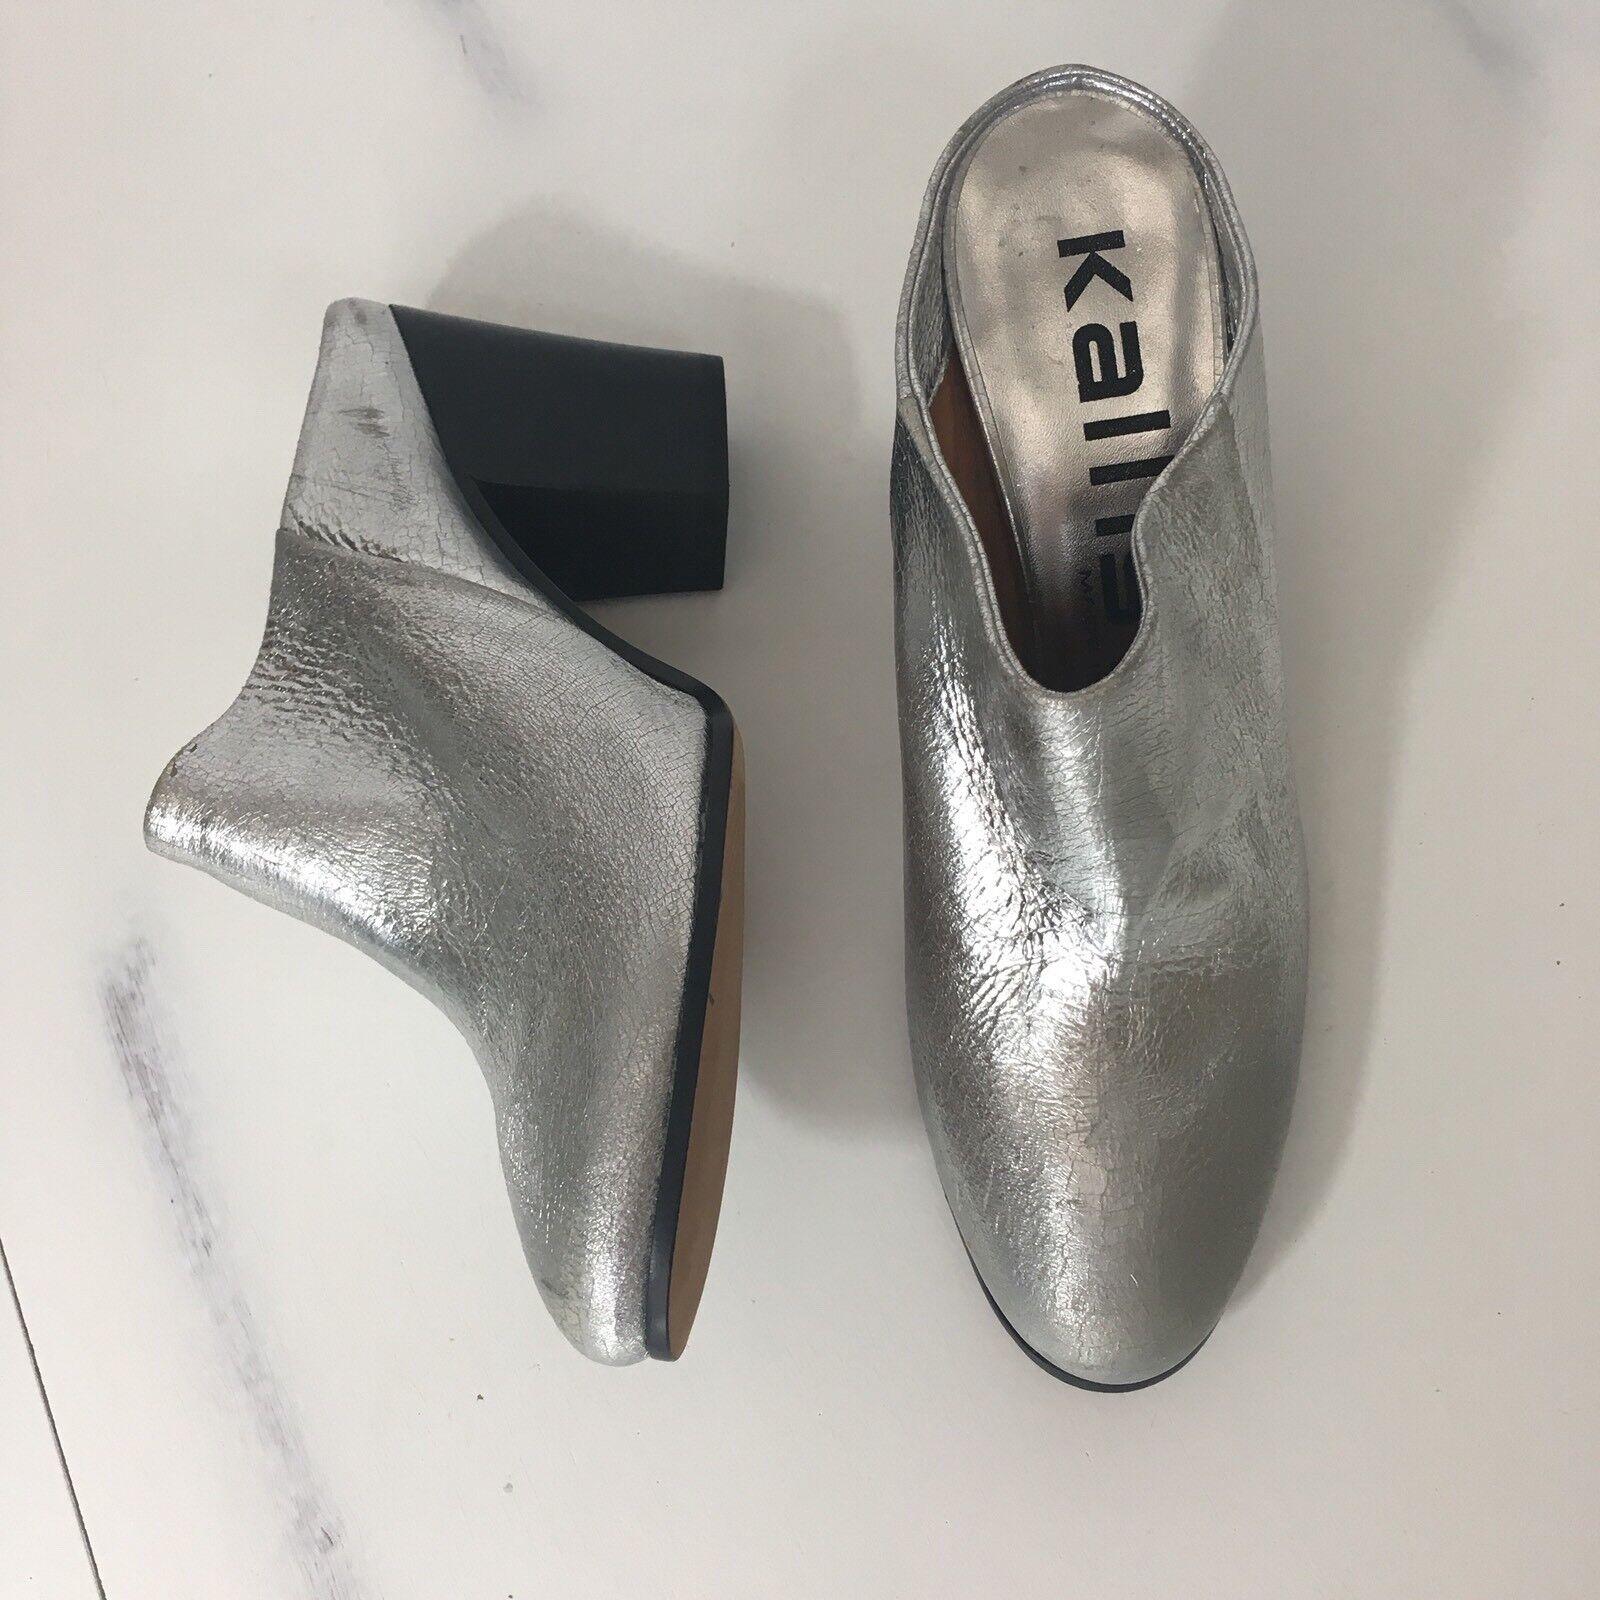 Kalliste Womens Metallic Silver Backless Boots Booties Slip ons size US 7 Eur 37